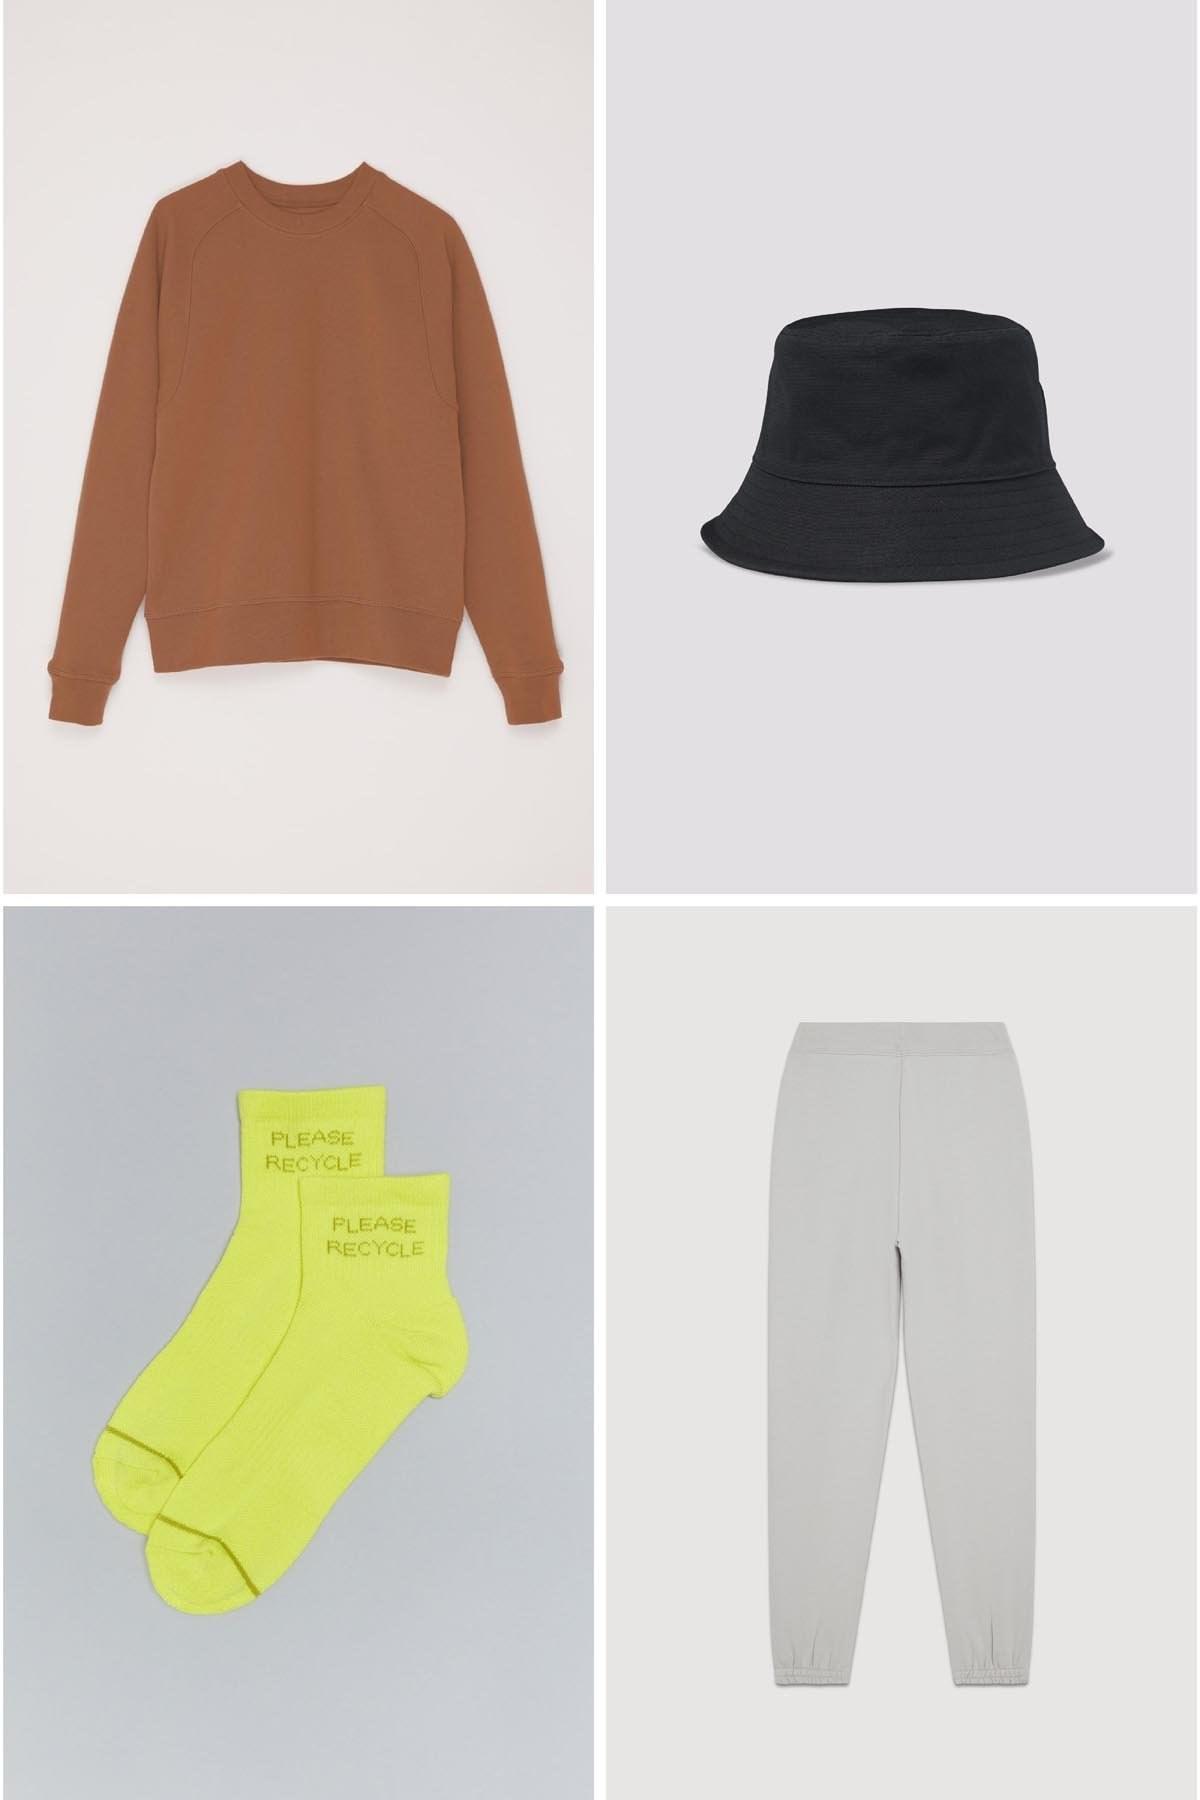 brown crewneck sweatshirt, black bucket hat, neon green socks, and grey sweatpants